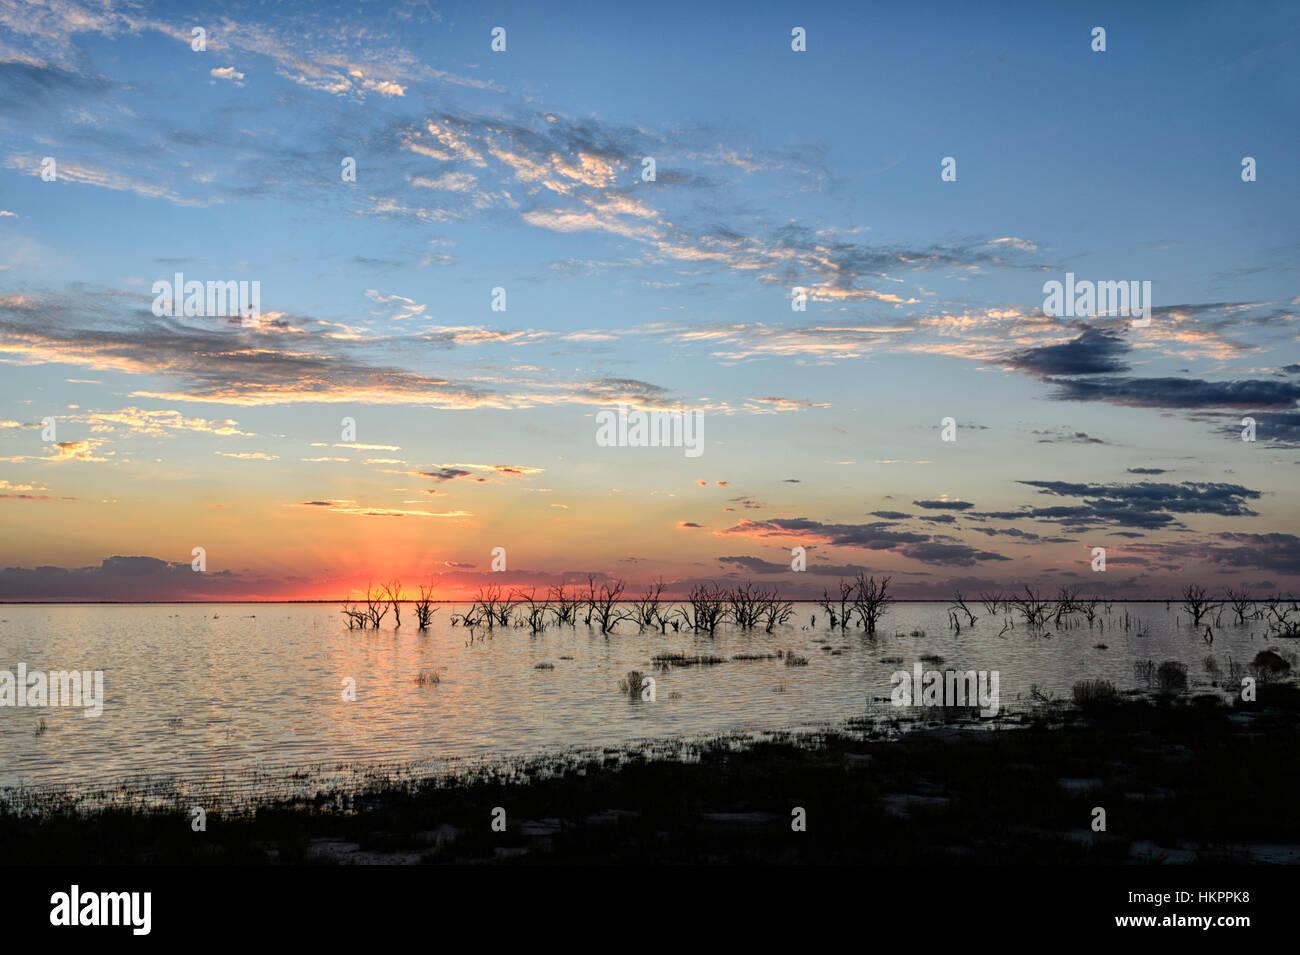 Puesta de sol sobre el lago Menindee, New South Wales, Australia Imagen De Stock